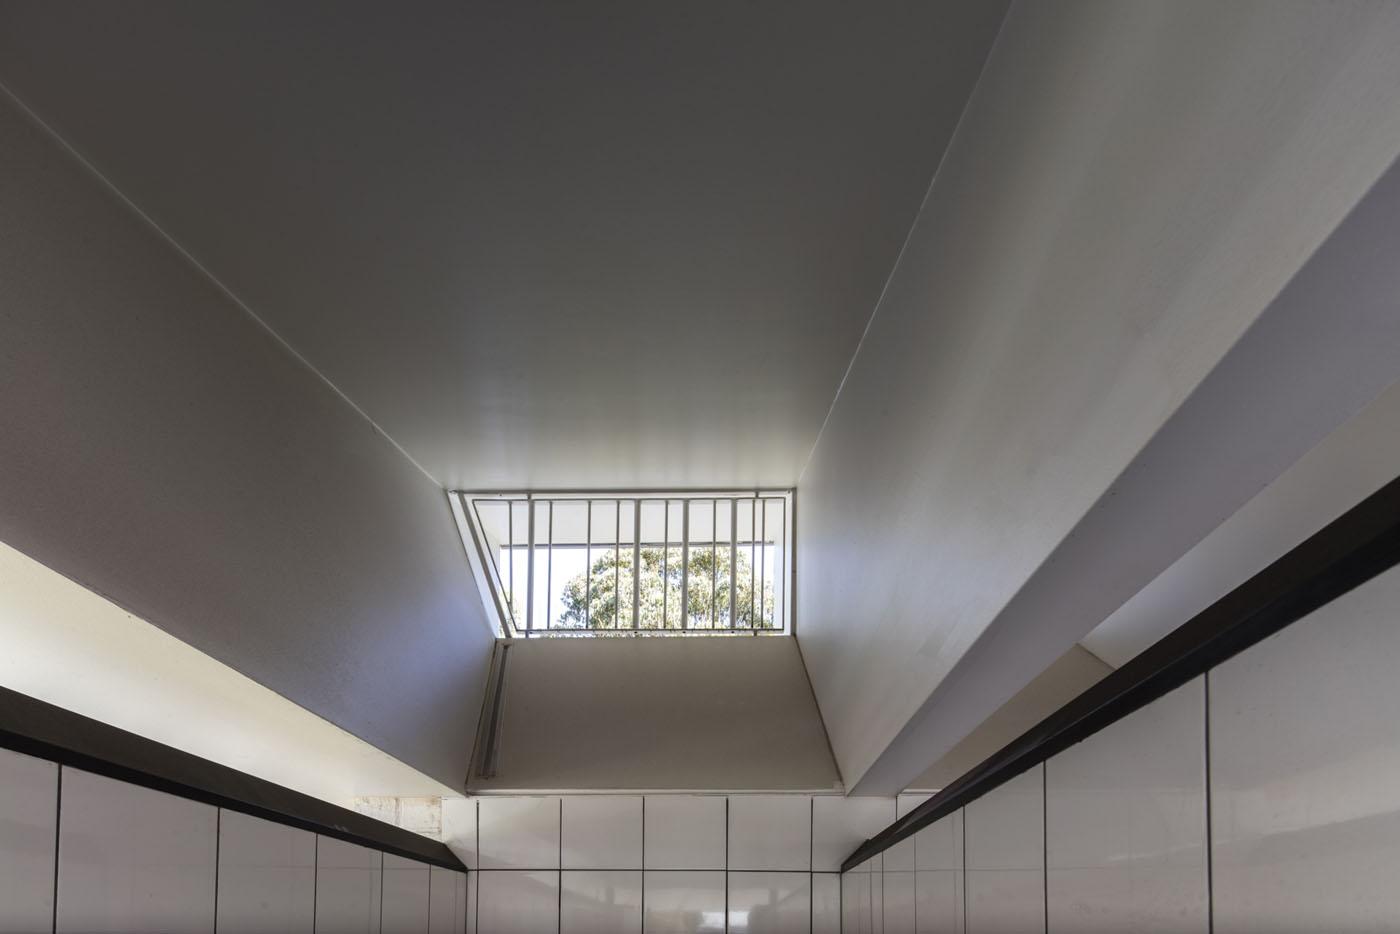 Sydenham Green Amenities by Sam Crawford Architects, Sydney. Light tunnels.